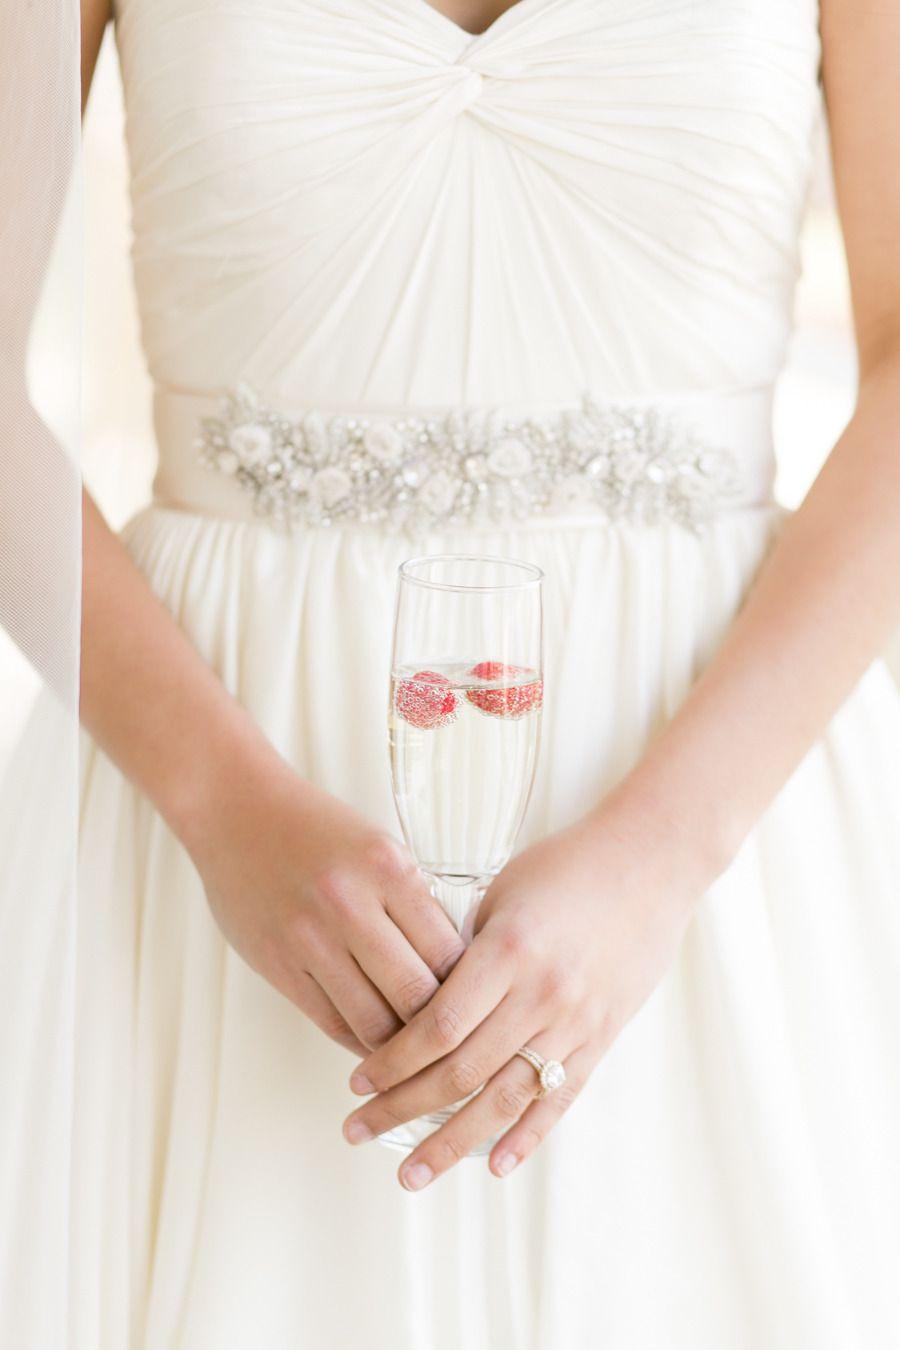 Photography: Amalie Orrange Photography - amalieorrangephotography.com  Read More: http://www.stylemepretty.com/southeast-weddings/2014/04/18/raspberry-striped-wedding-inspiration/